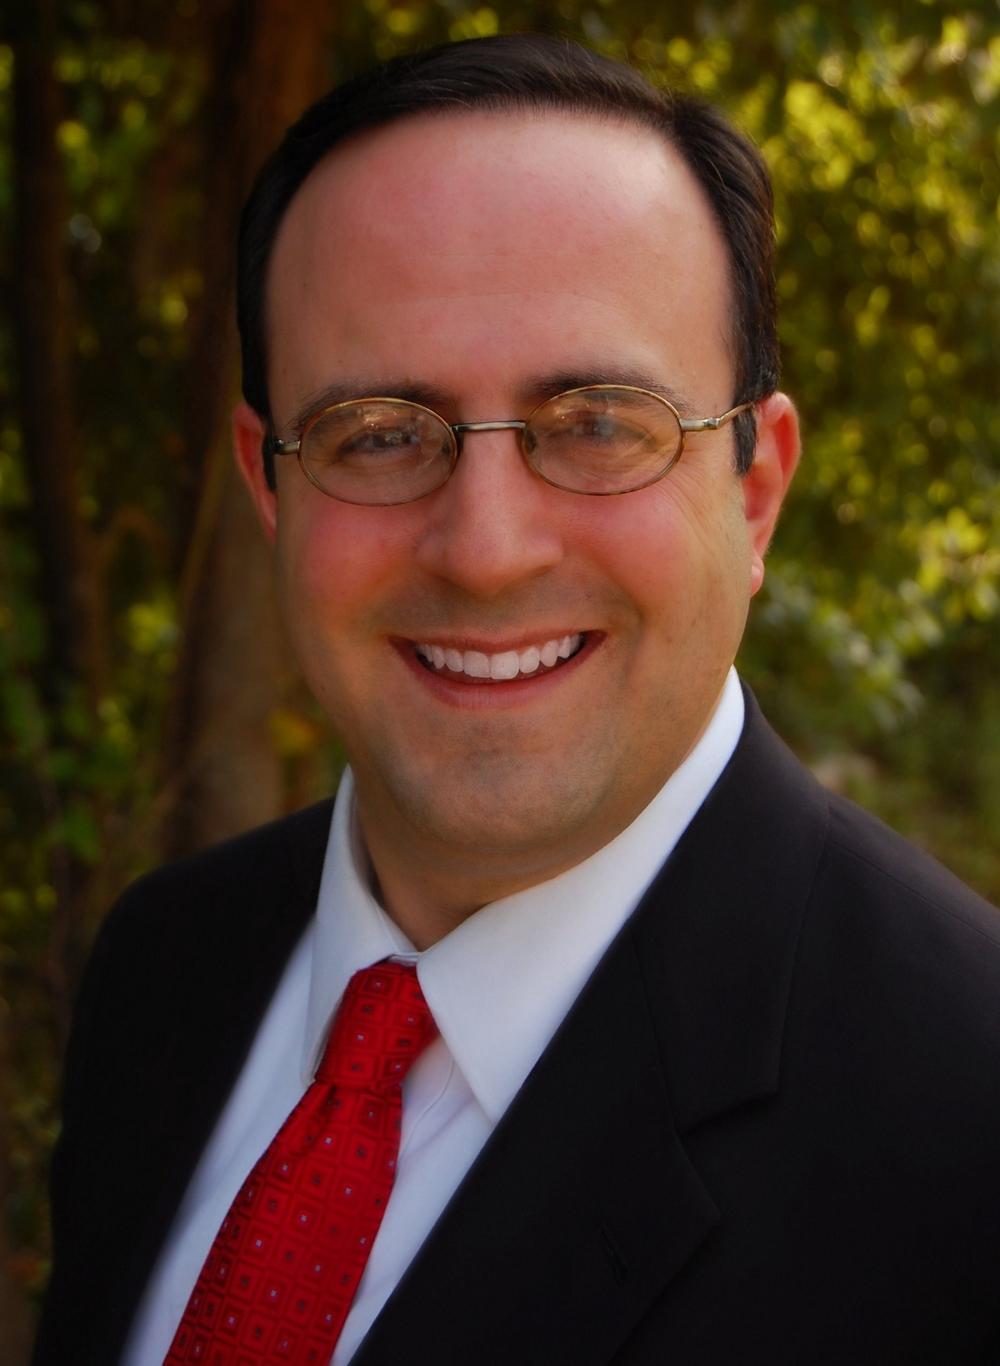 Savannah, Georgia Estate Planning, Elder Law and Special Needs Attorney, Richard S. Barid